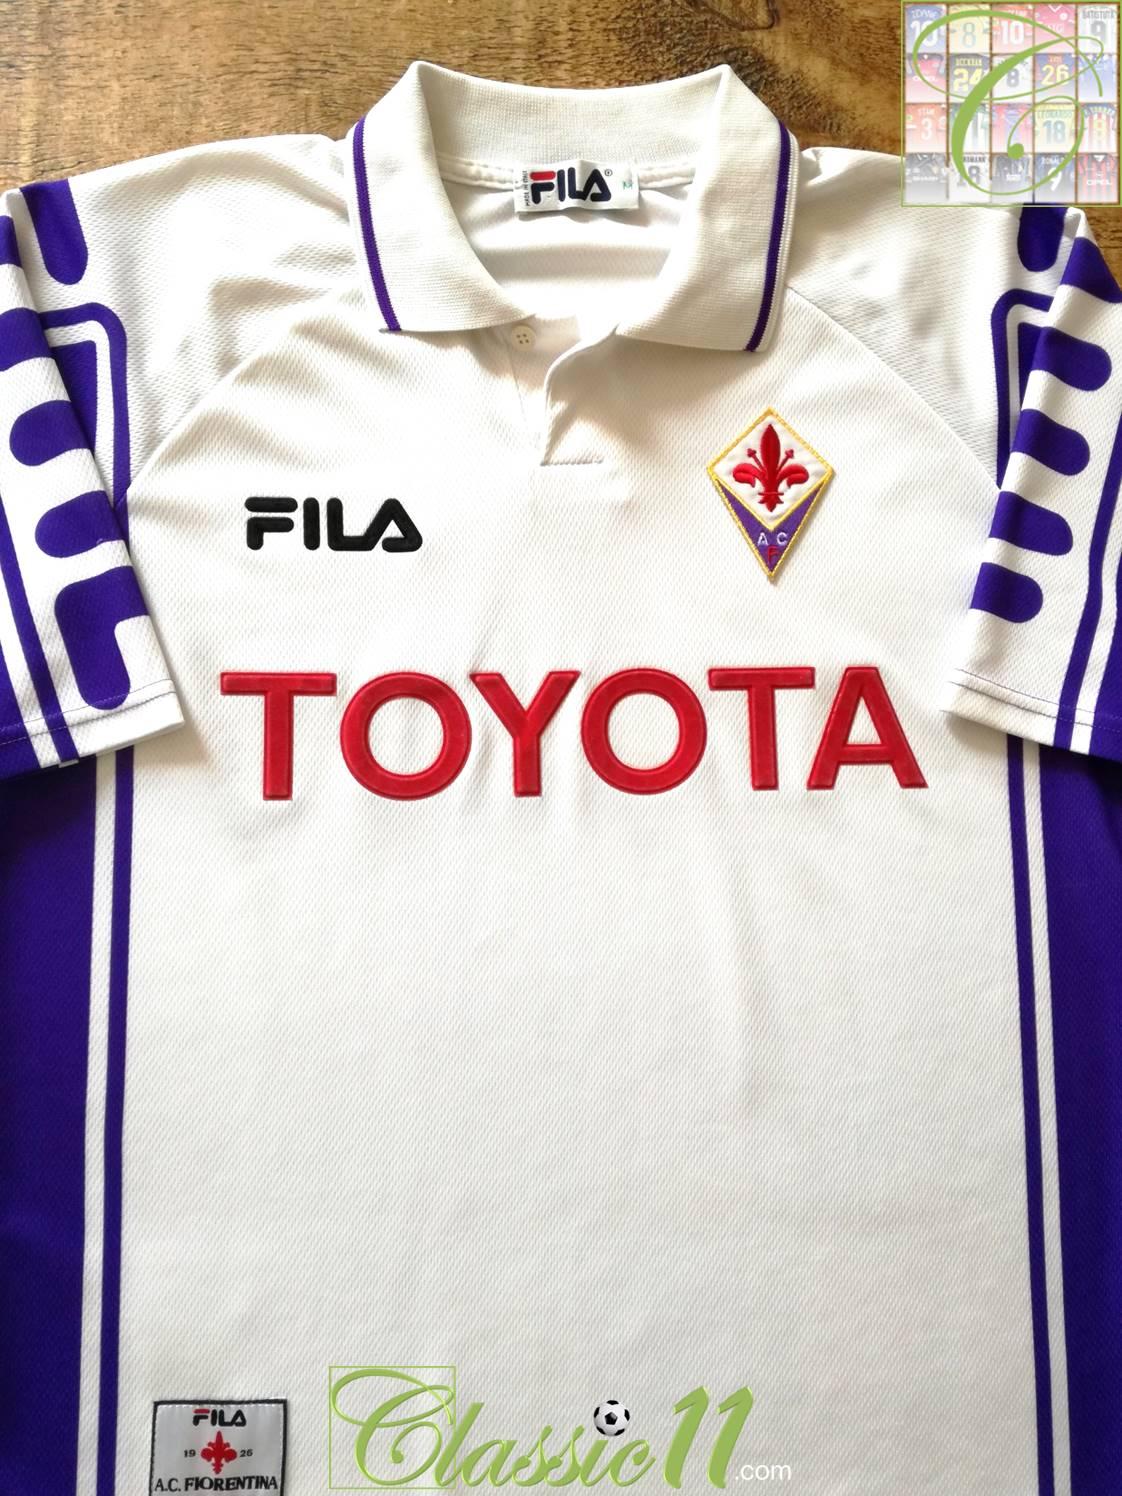 Fiorentina Away football shirt 1999 - 2000. Sponsored by Toyota